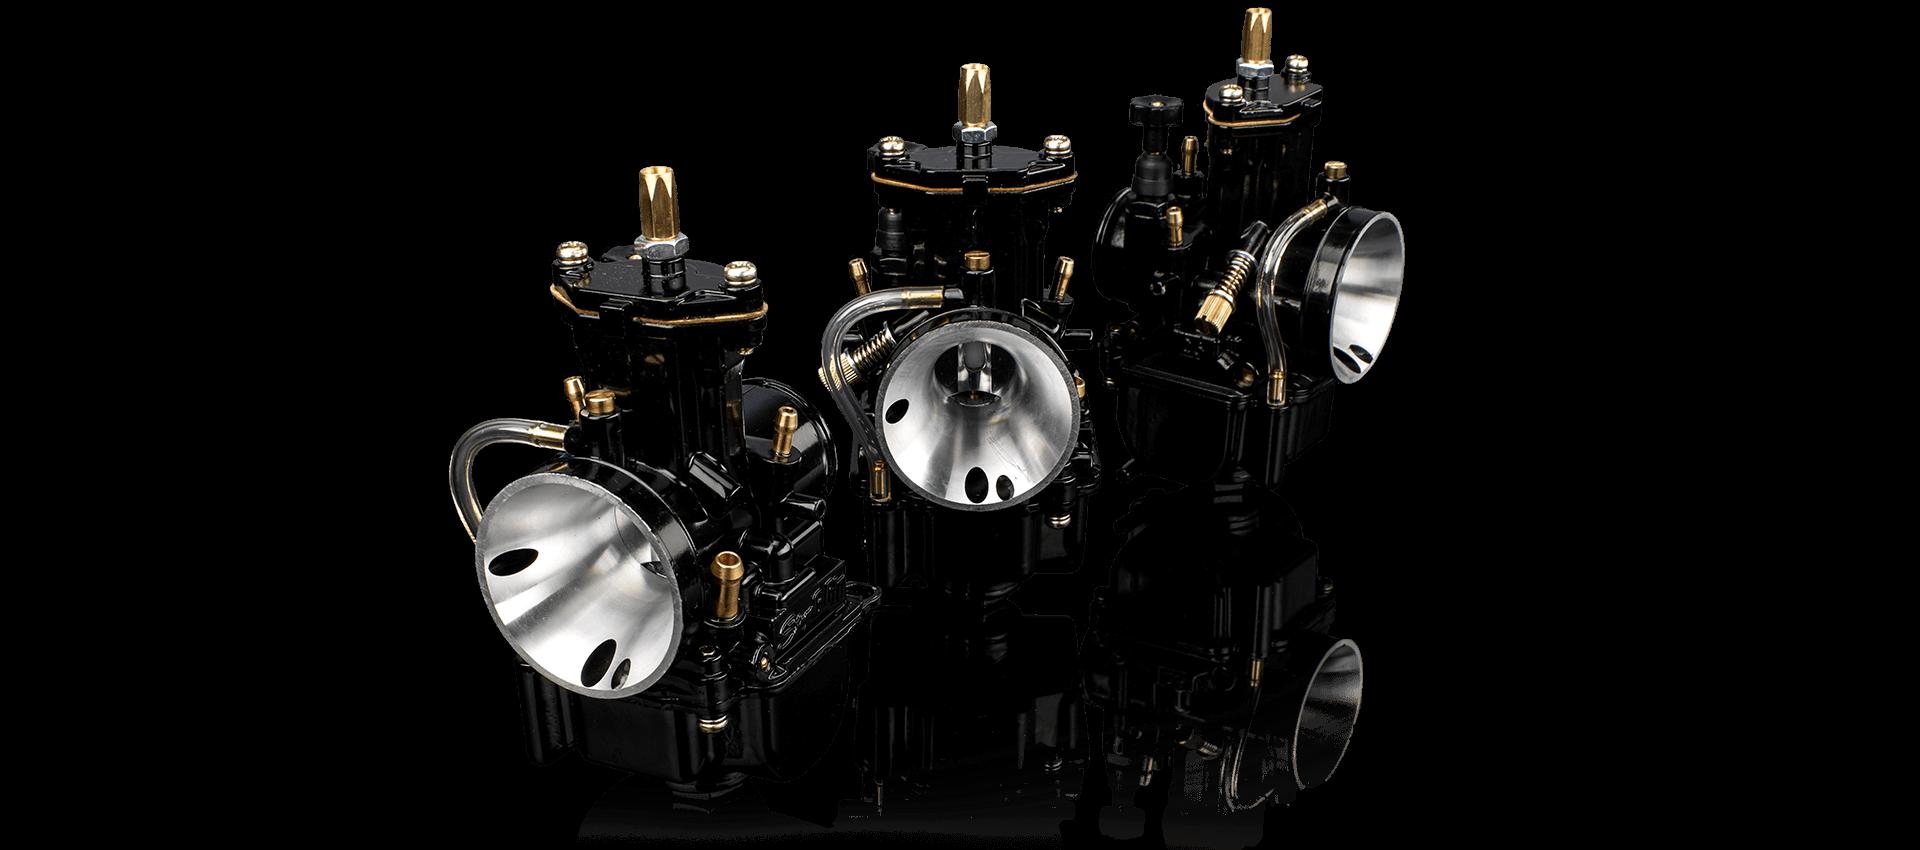 Stage6 Carburetor Parts Catalogue